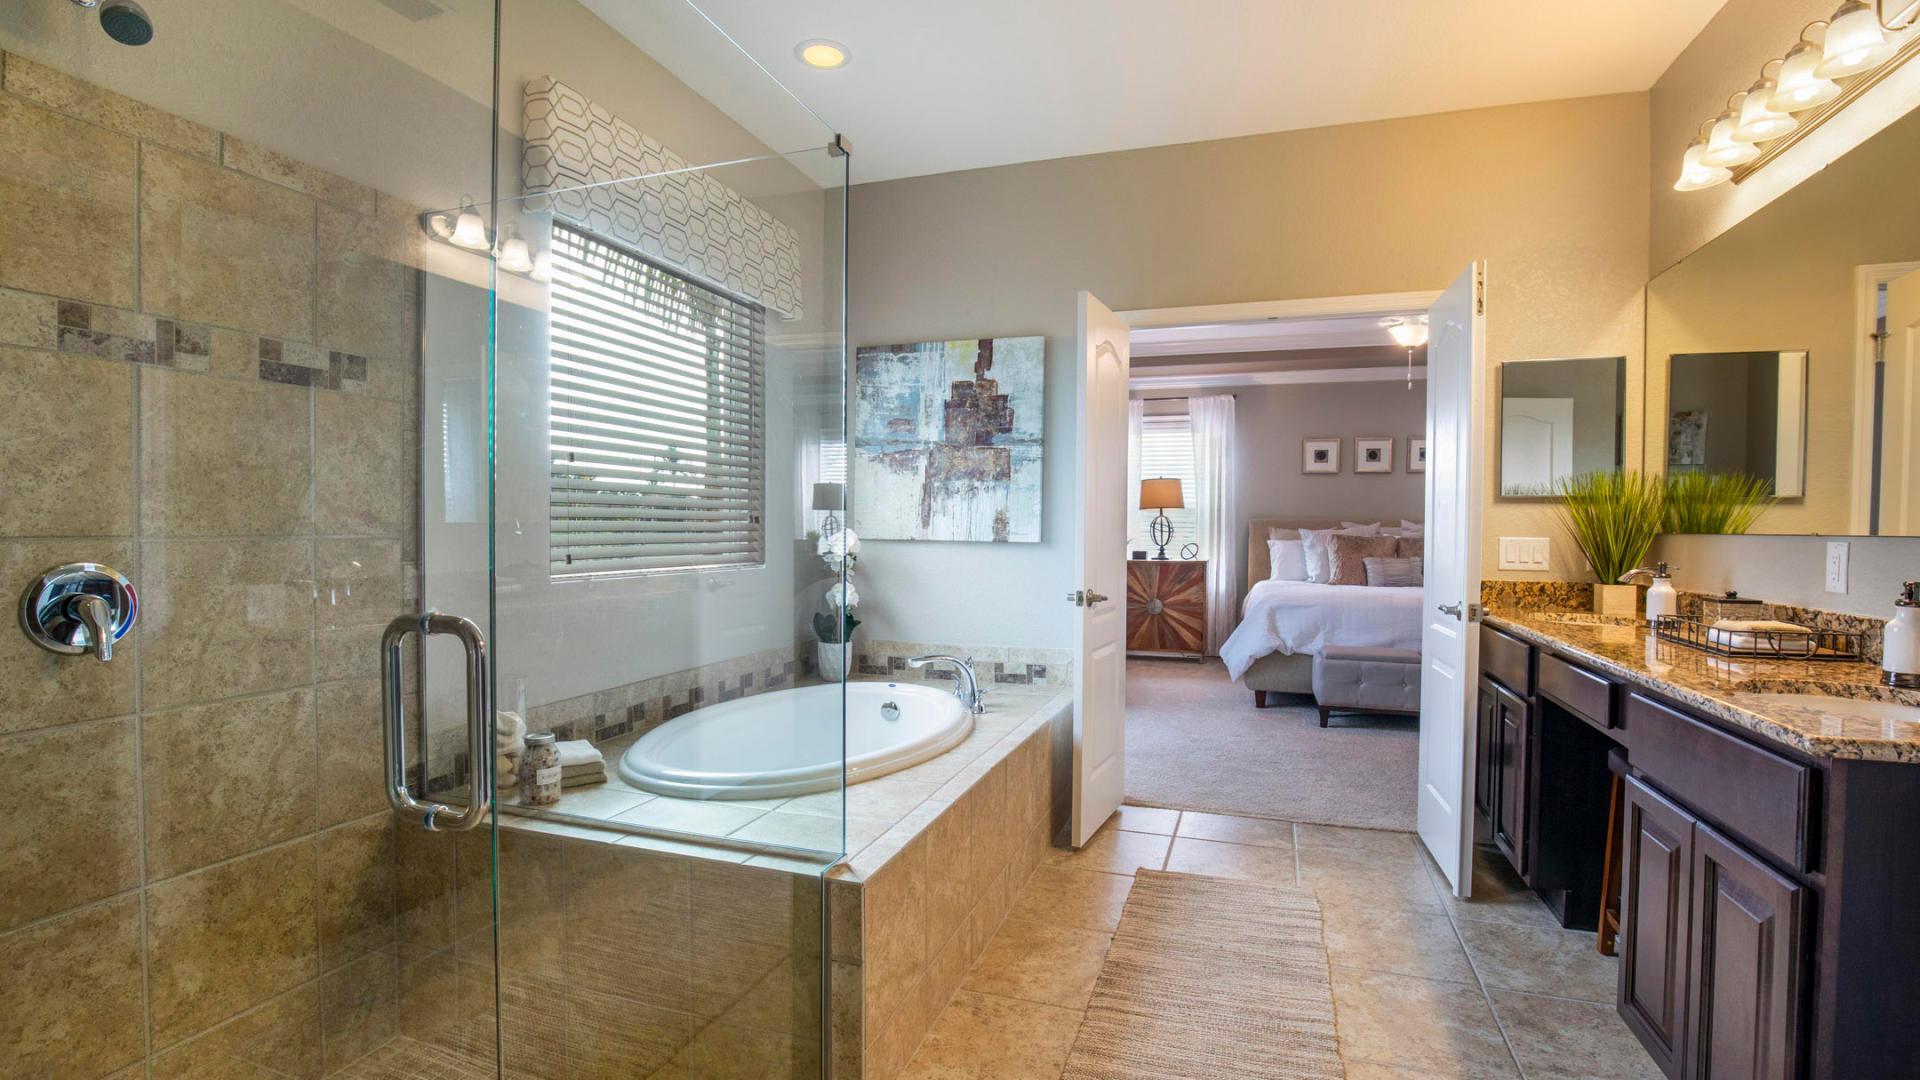 Bathroom featured in the Venice By Maronda Homes in Punta Gorda, FL